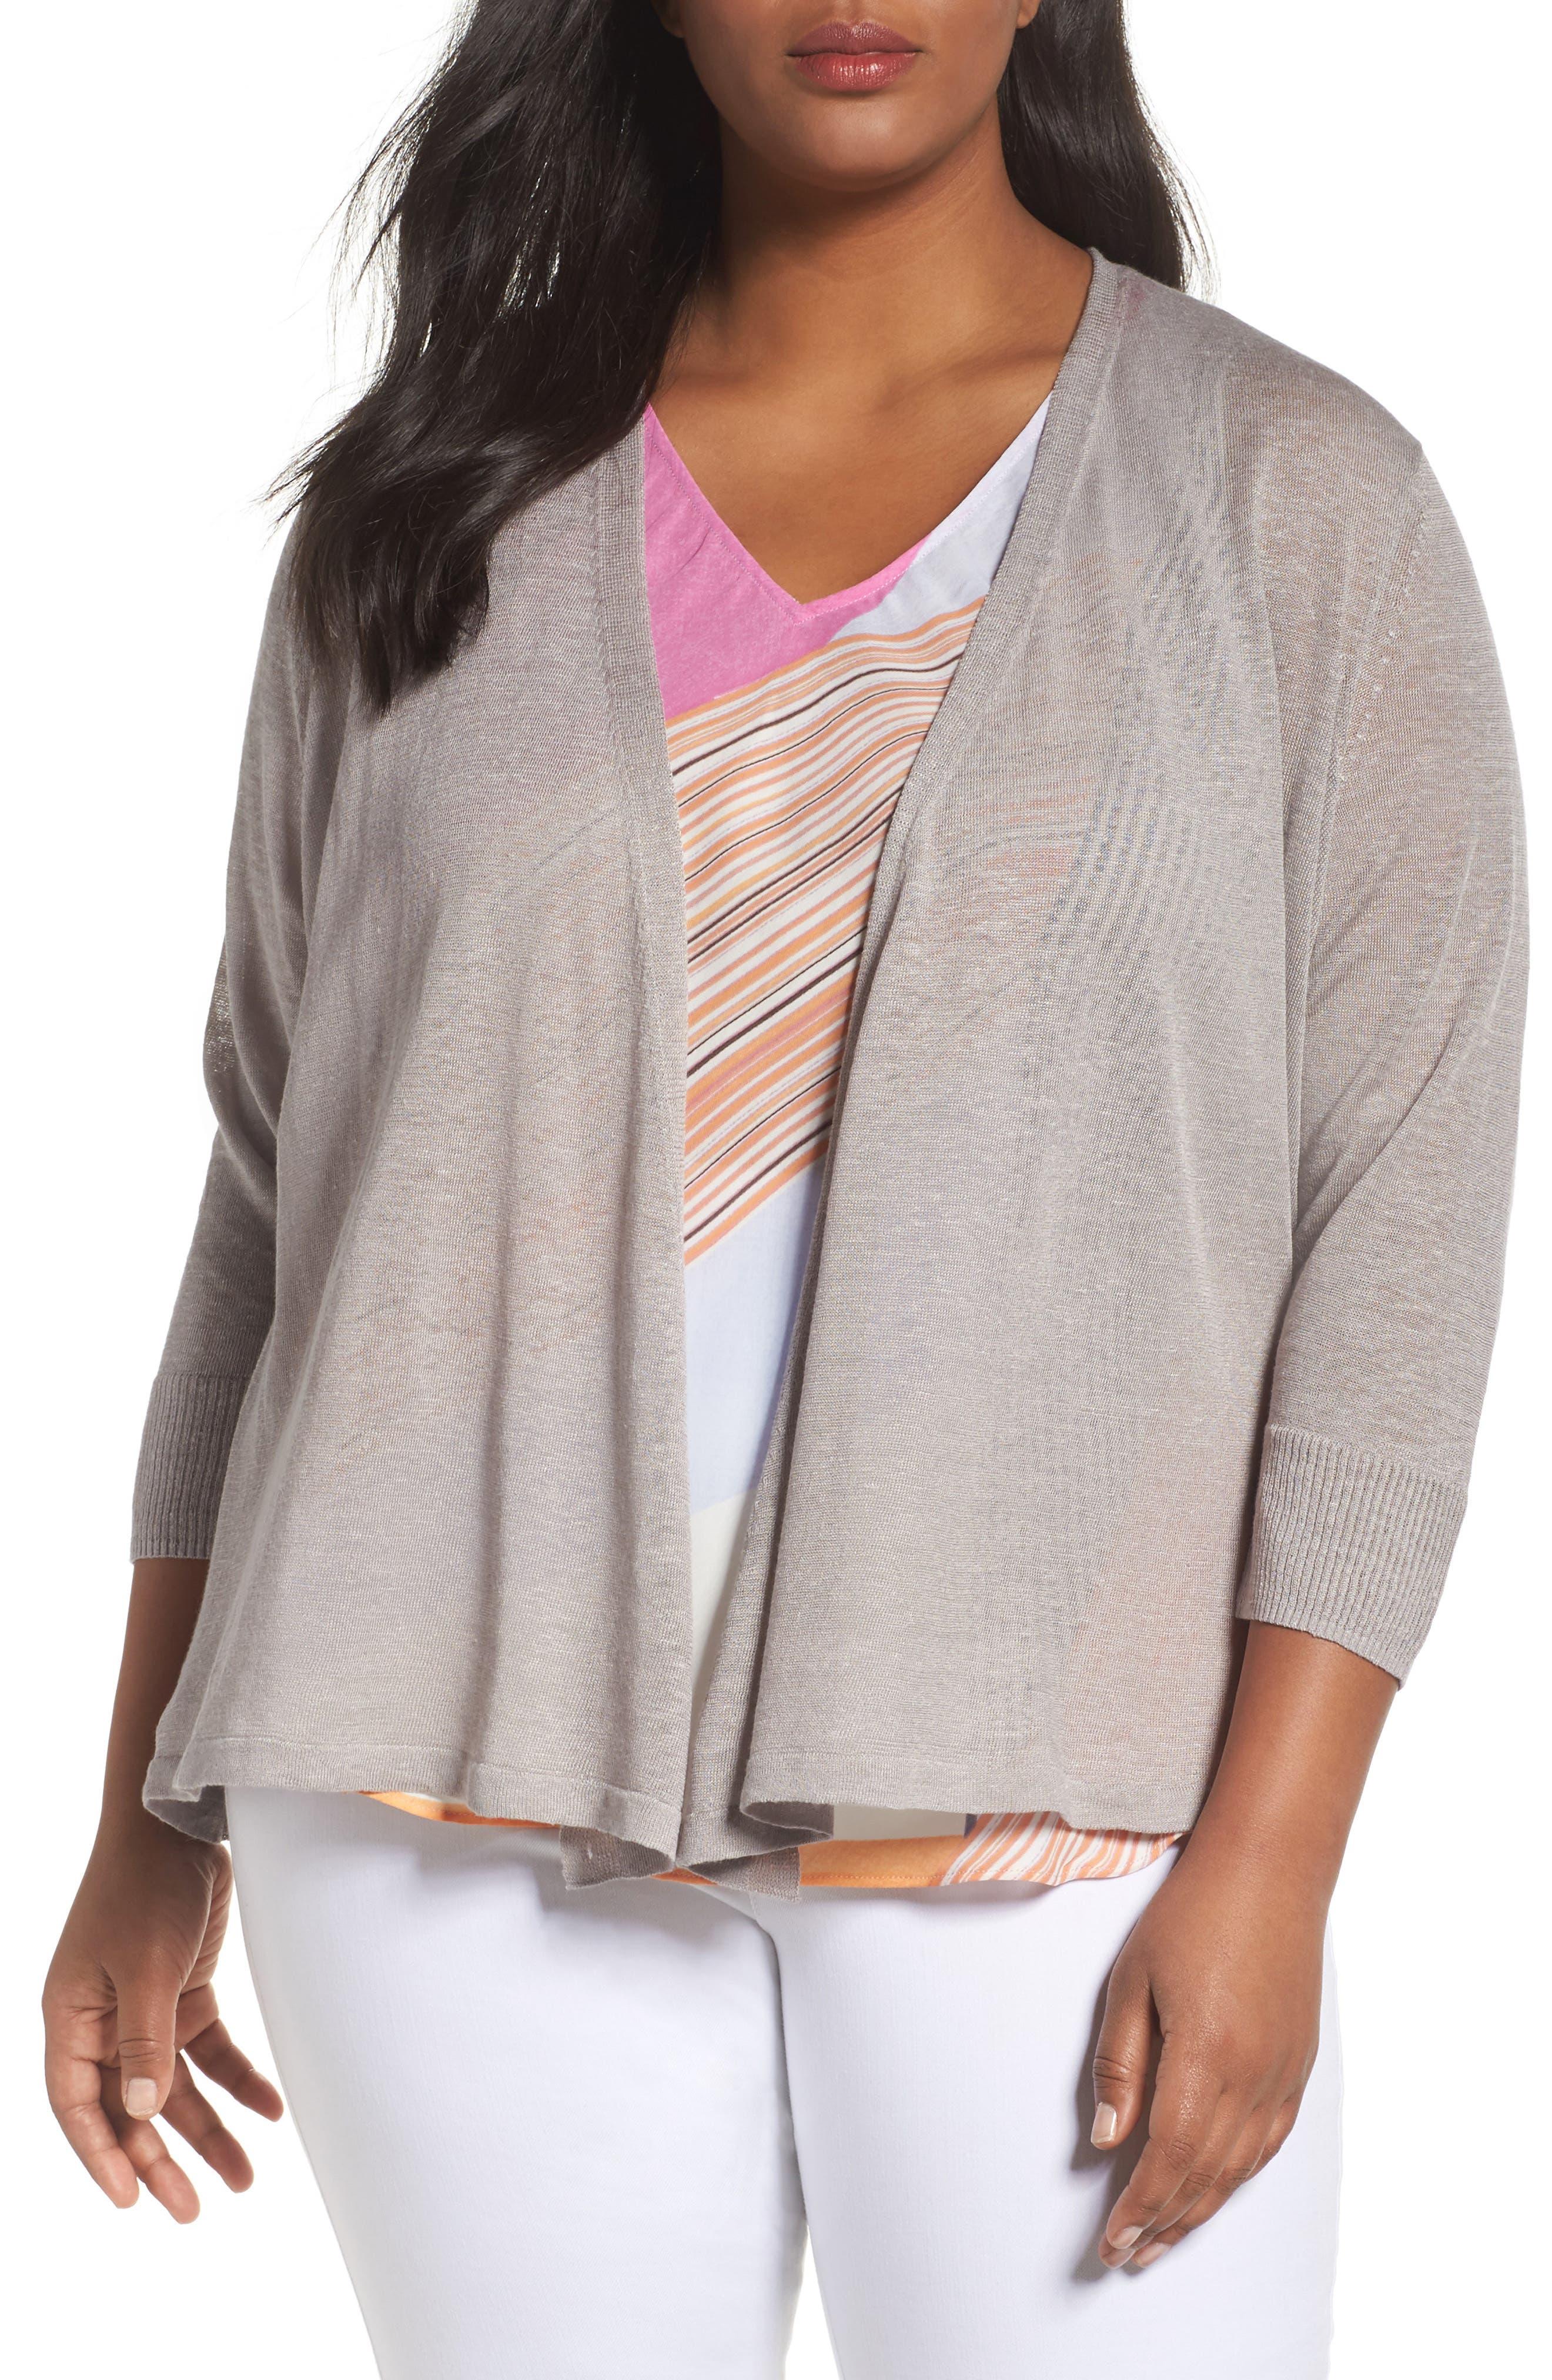 Alternate Image 1 Selected - NIC+ZOE '4-Way' Three Quarter Sleeve Convertible Cardigan (Plus Size)